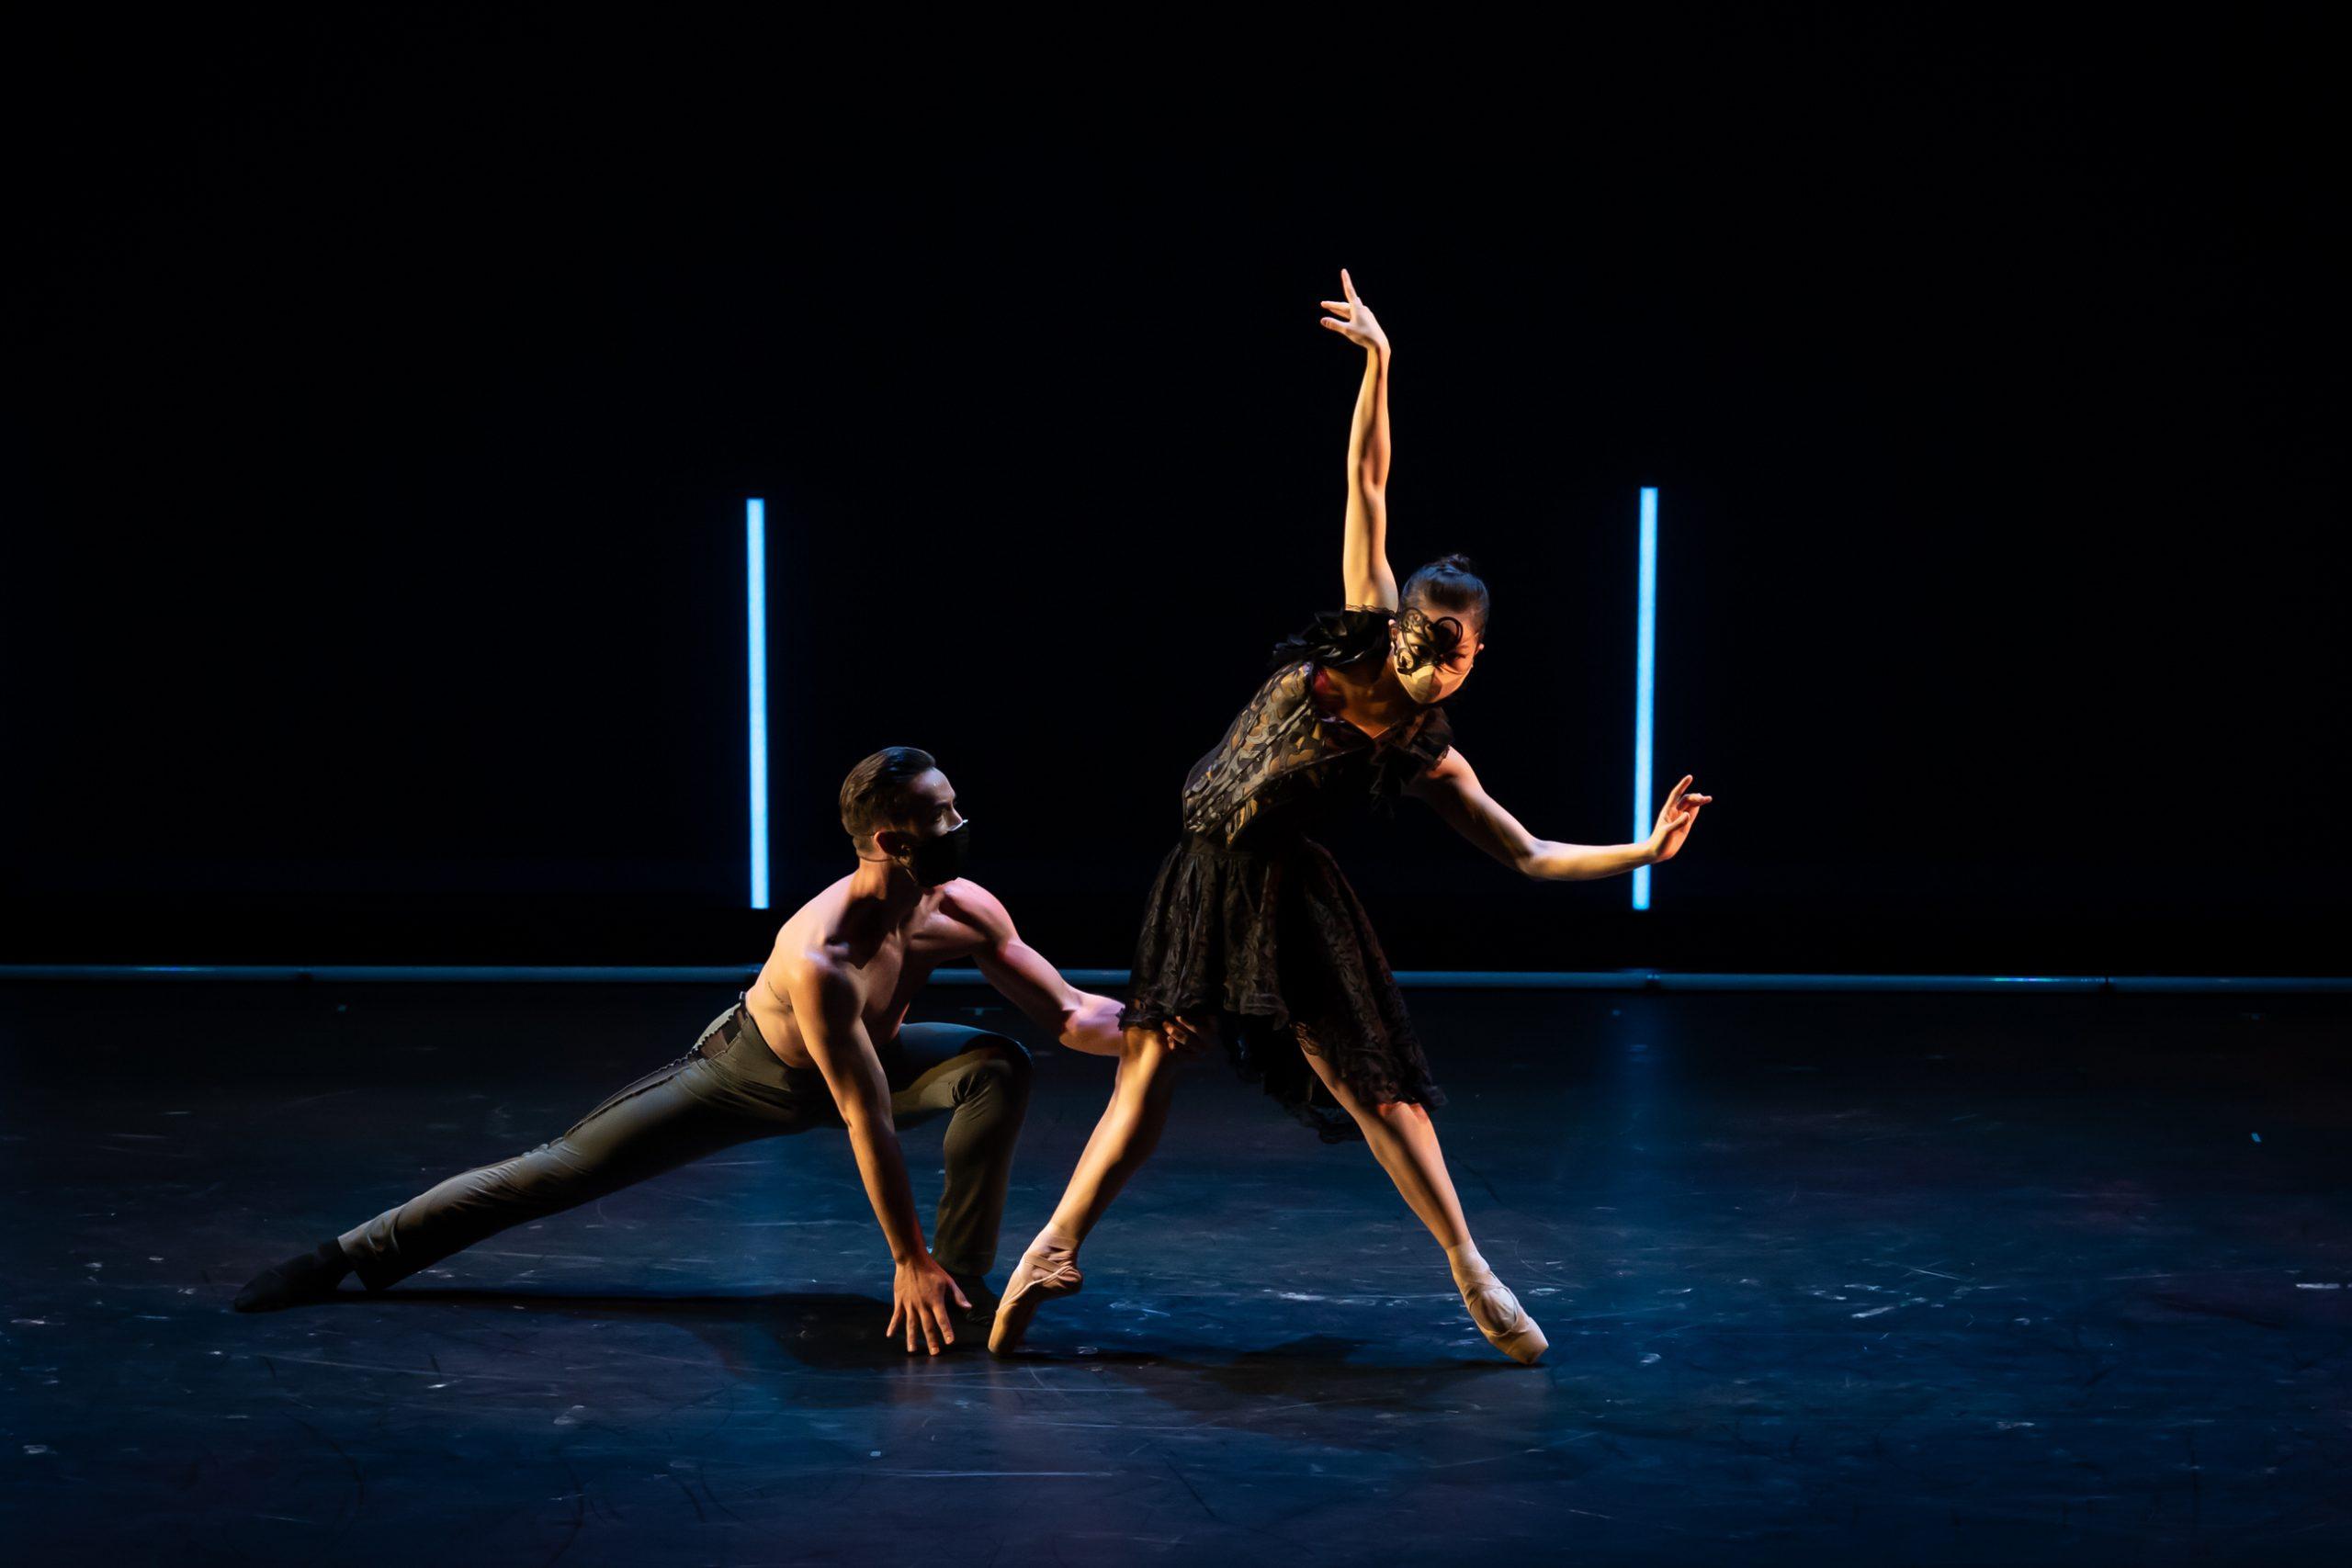 Experience the Cincinnati Ballet at Home With Its Free Digital Showings - Cincinnati Magazine